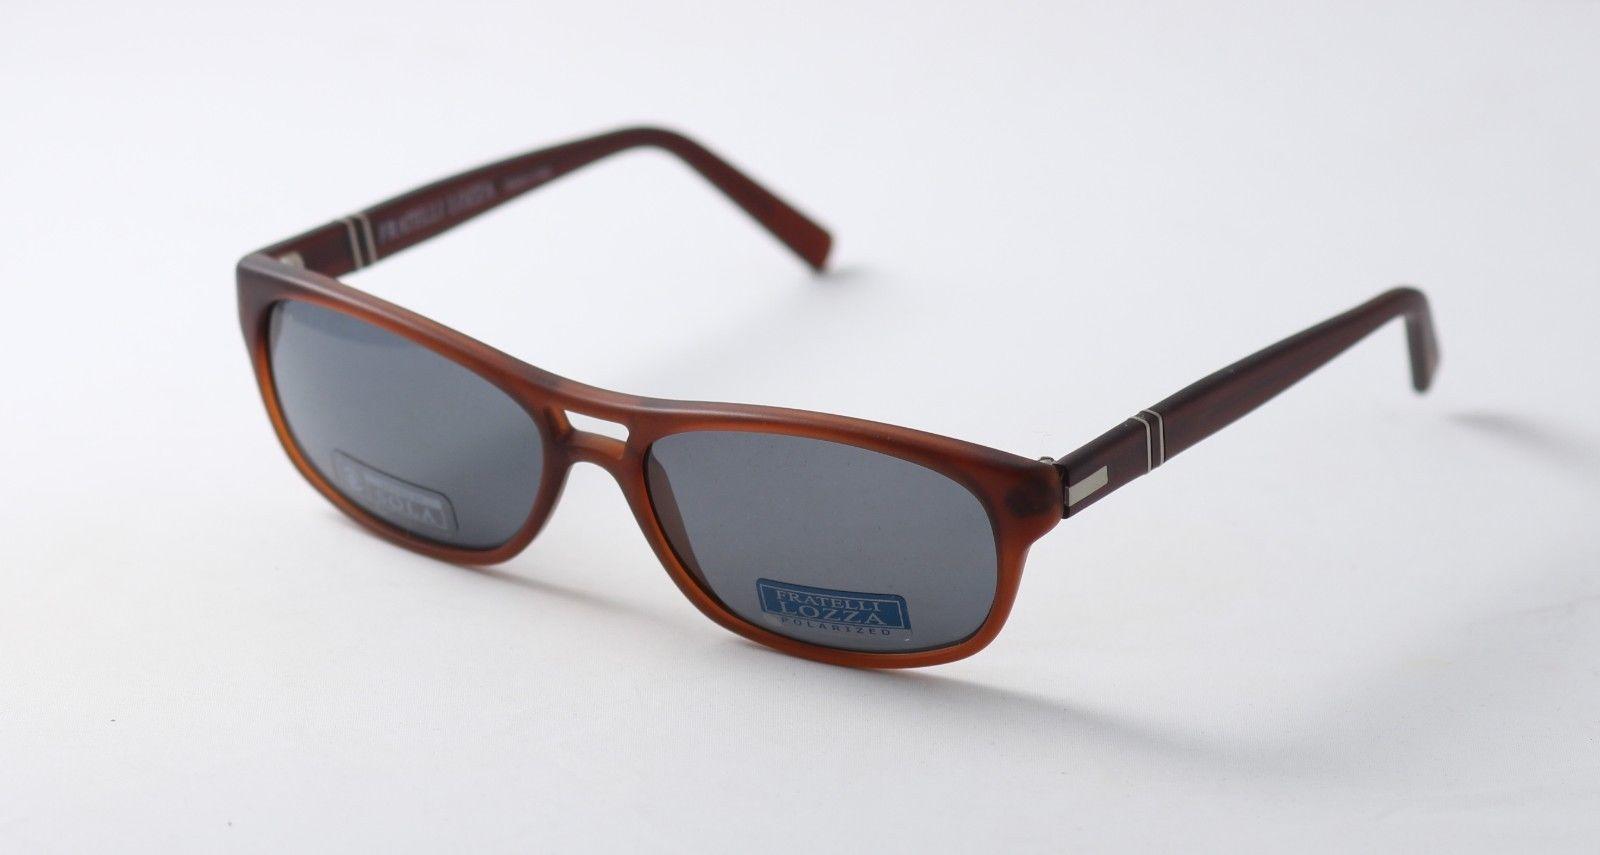 8bbf229a52 New Fratelli Lozza Sunglasses w  SOLA Polarized Lenses Alberto Olive ...